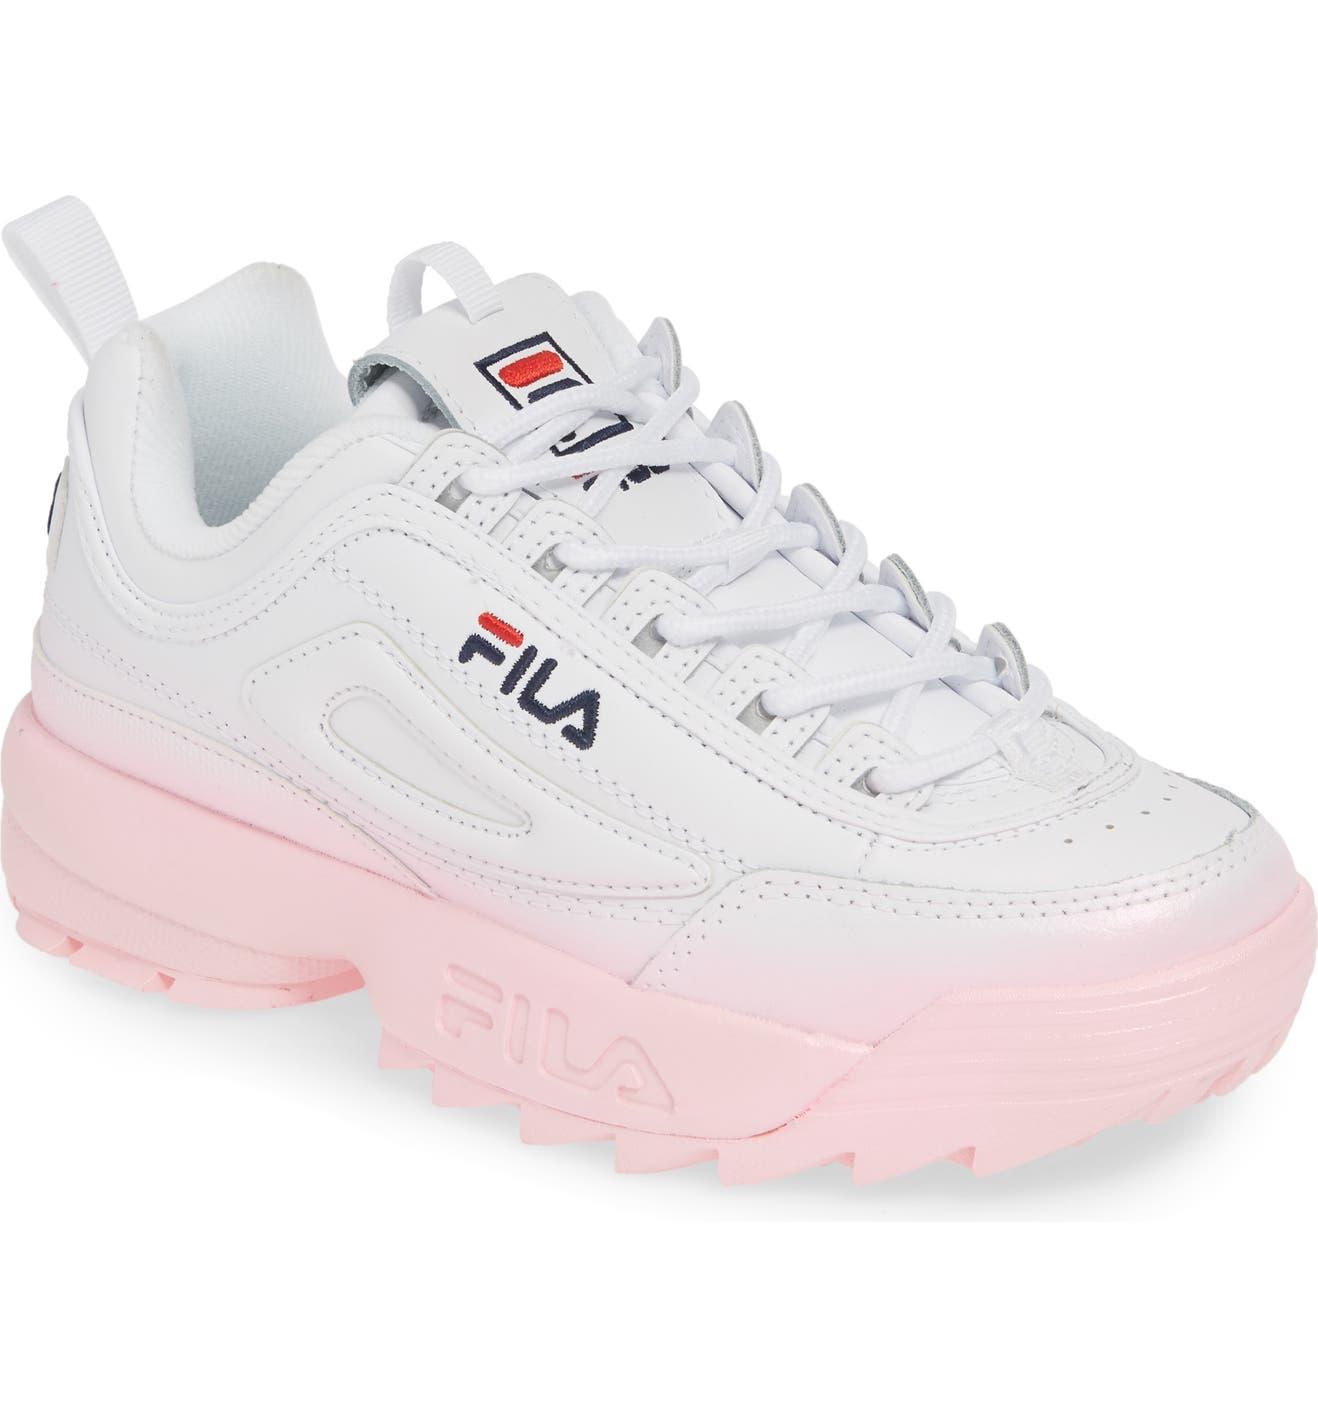 b25e464754 FILA Disruptor II Premium Fade Sneaker (Women)   Nordstrom